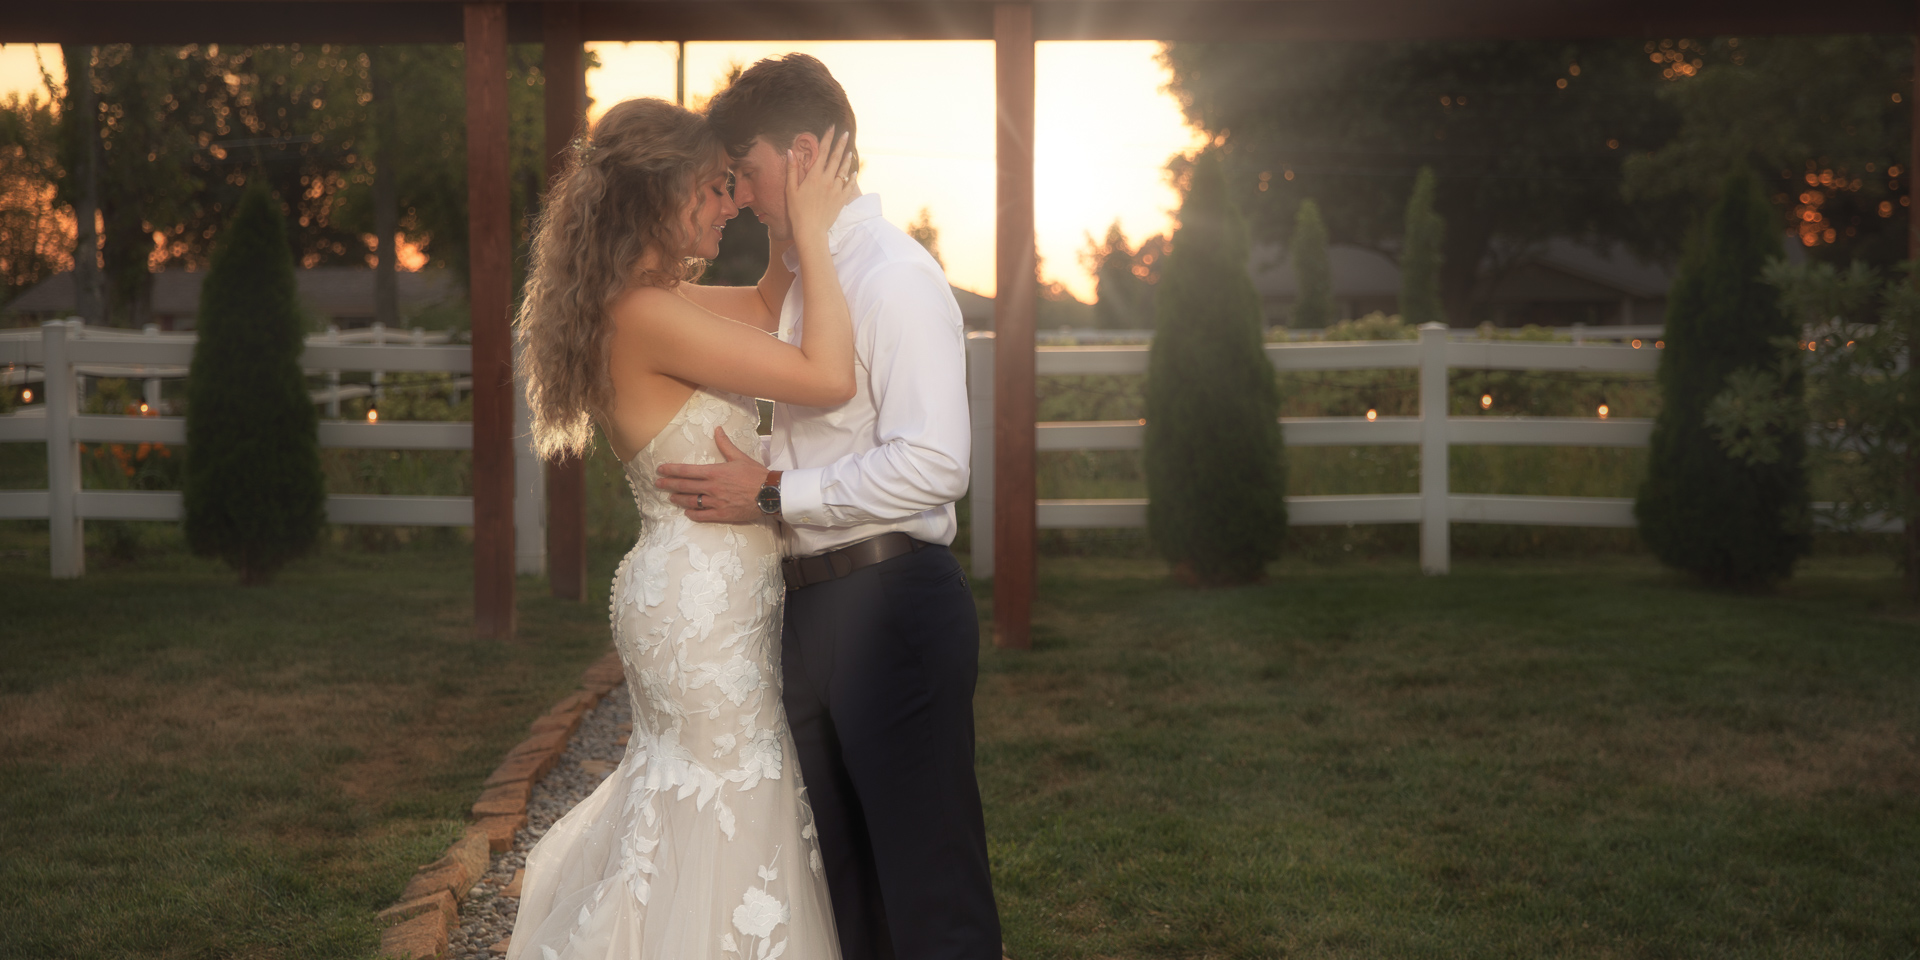 Marmalade Lily wedding sunset